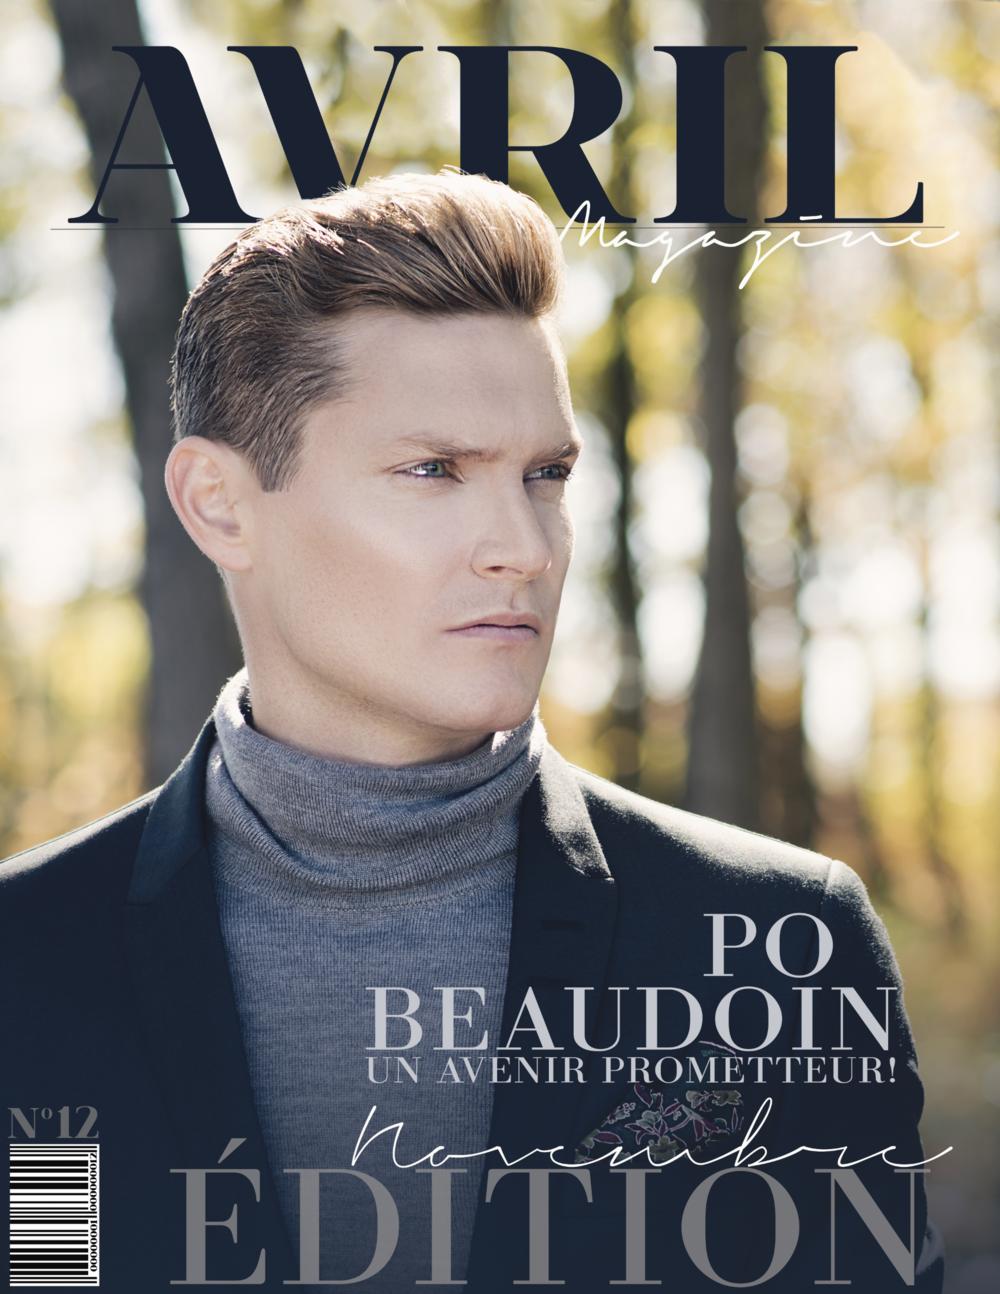 PO_Beaudoin_Avril_Magazine.png